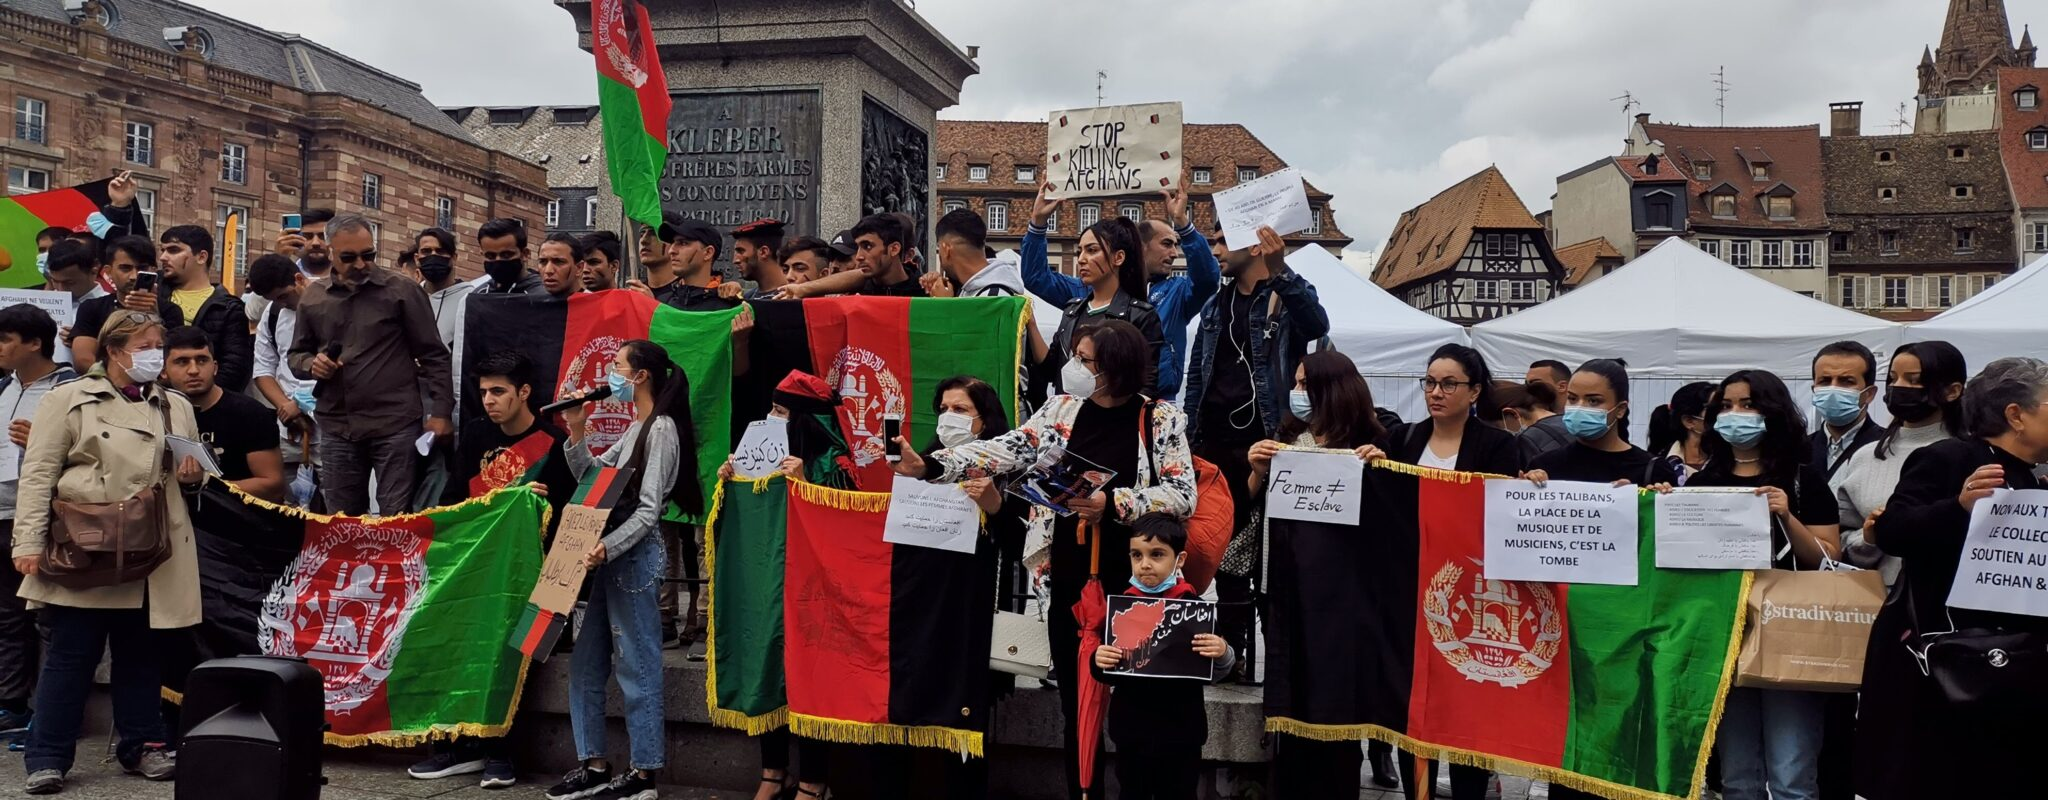 Afghans de Strasbourg : des années d'errance